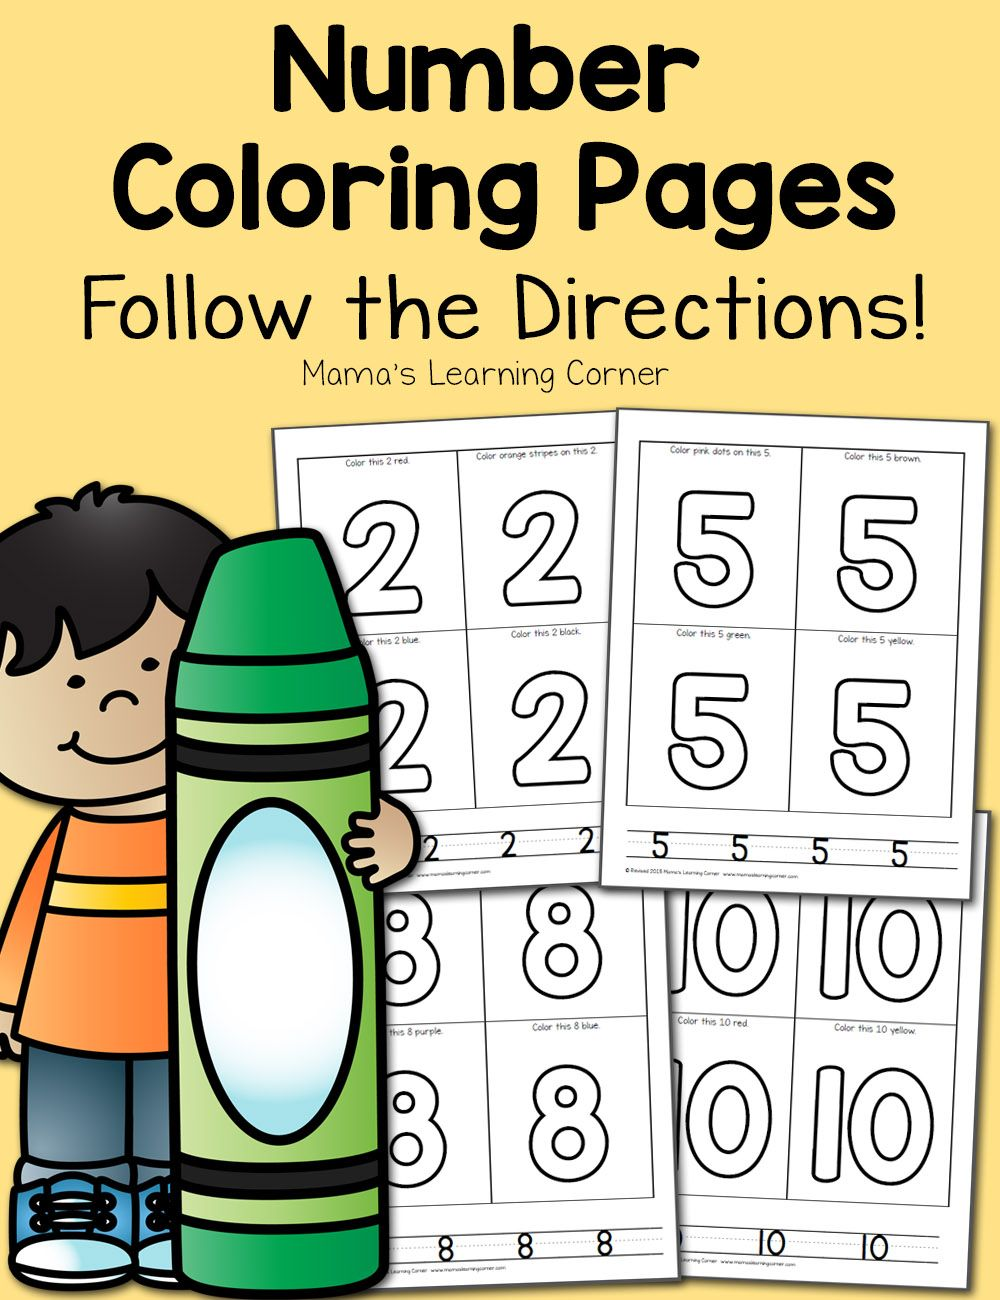 Number Coloring Pages For Preschool Numbers Preschool Kids Learning Activities Preschool